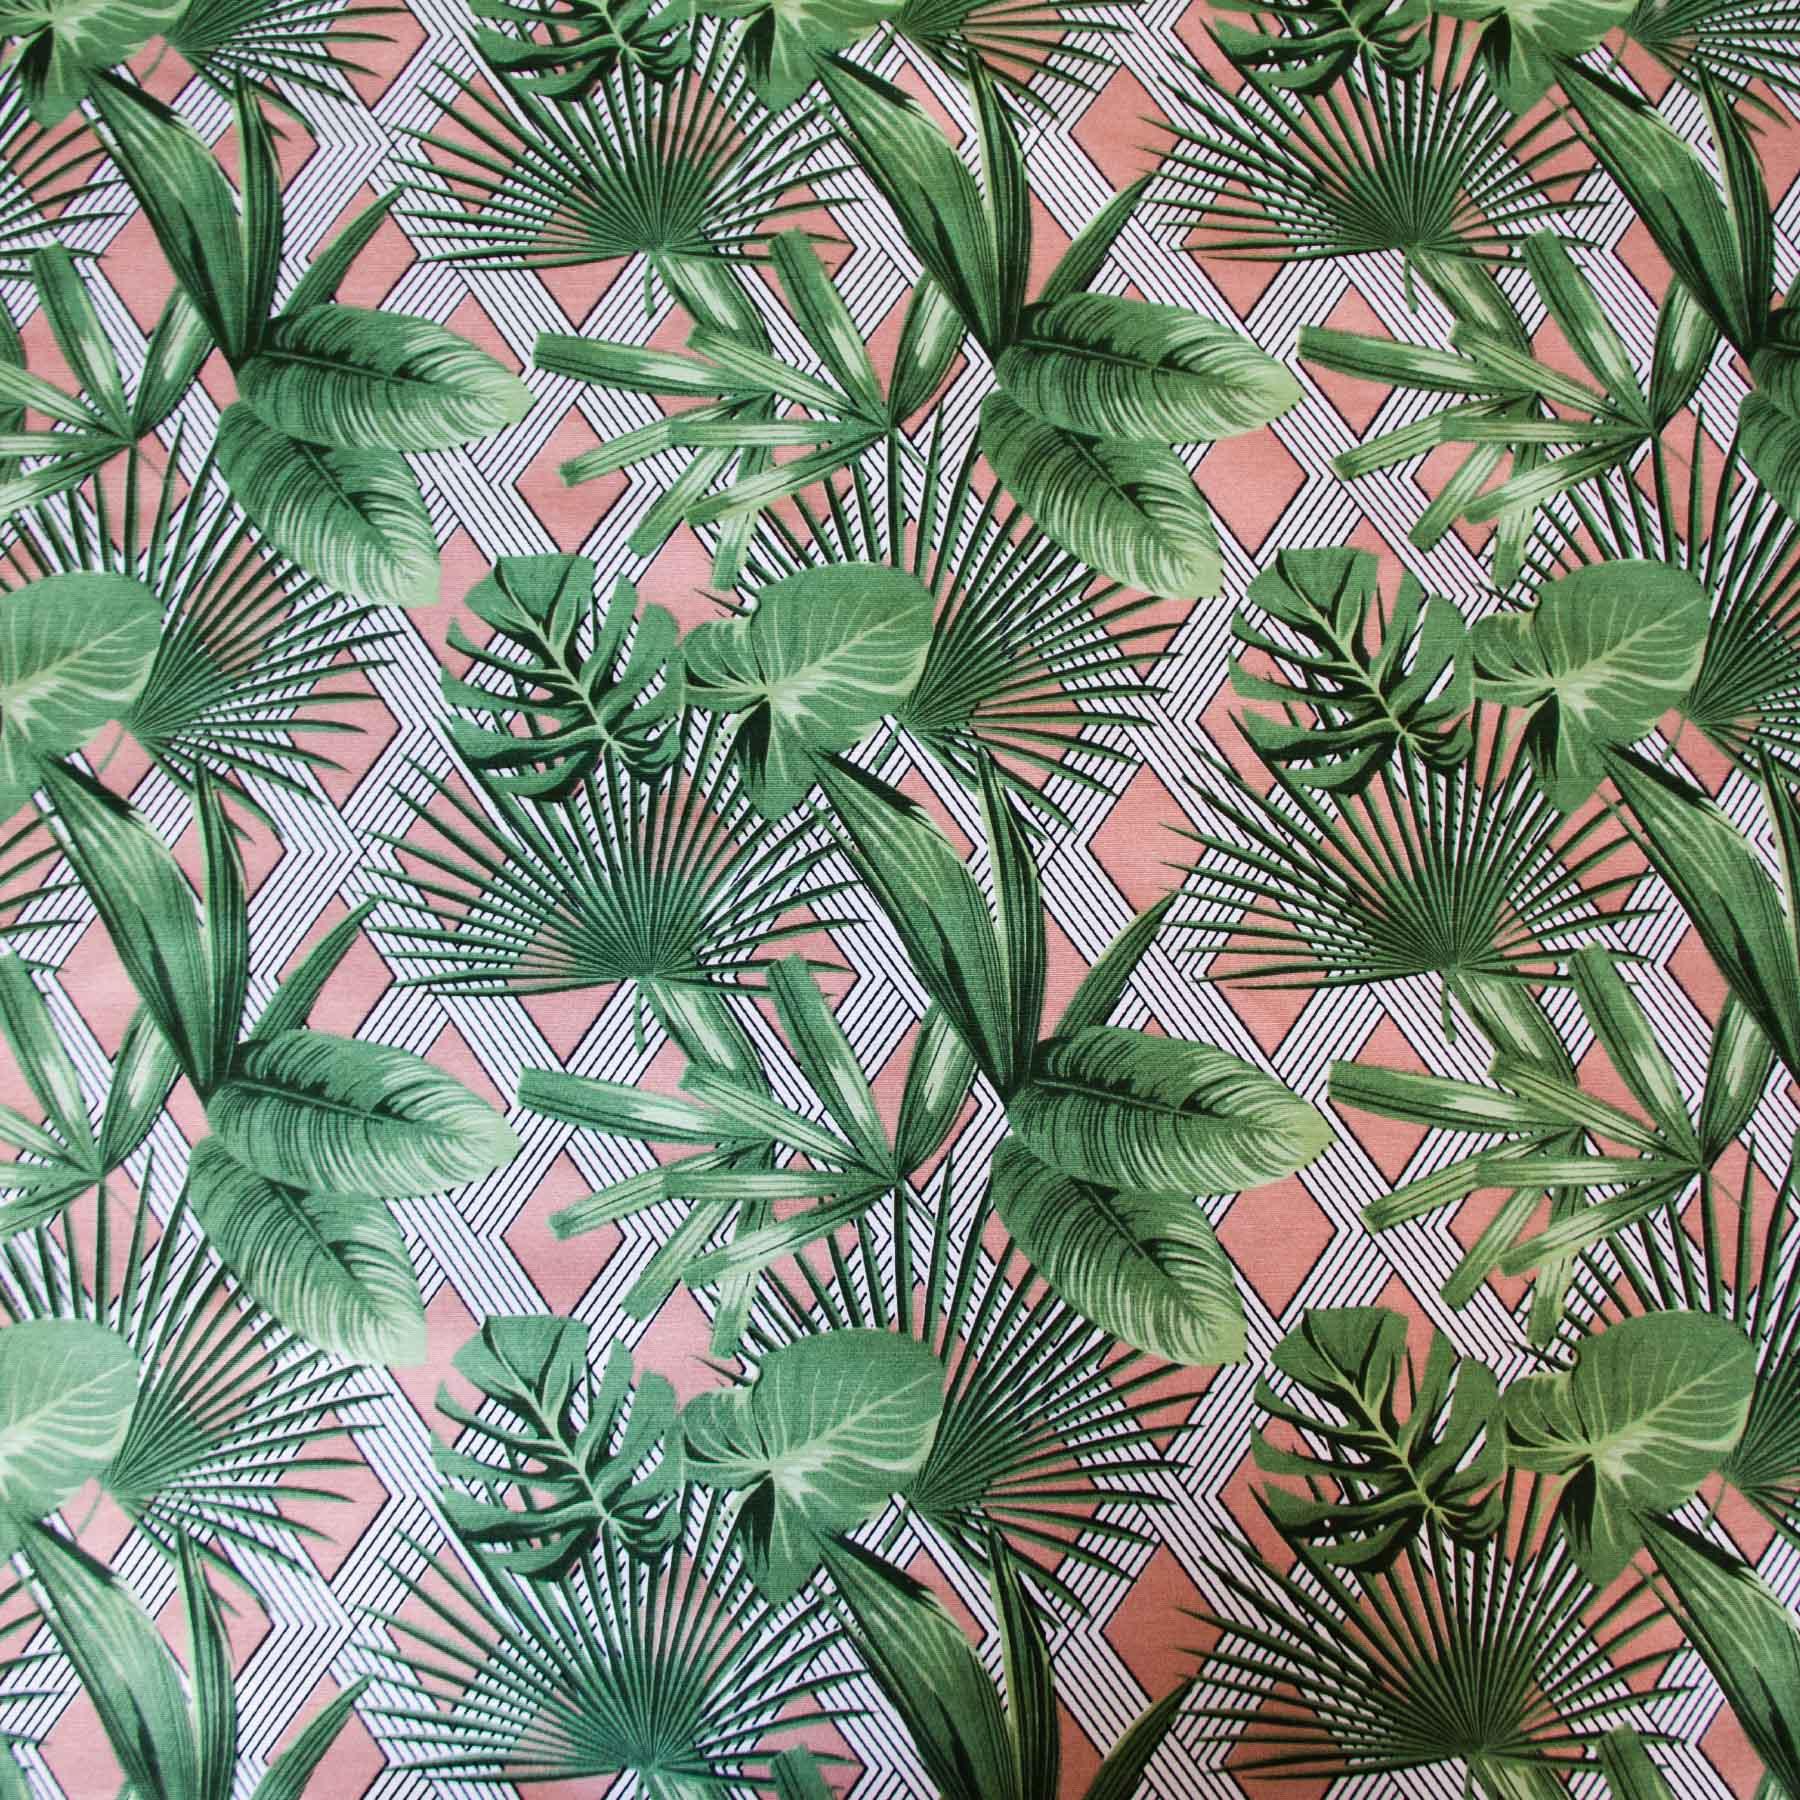 Tecido Antimanchas Folhagem verde fundo rosa - Summer